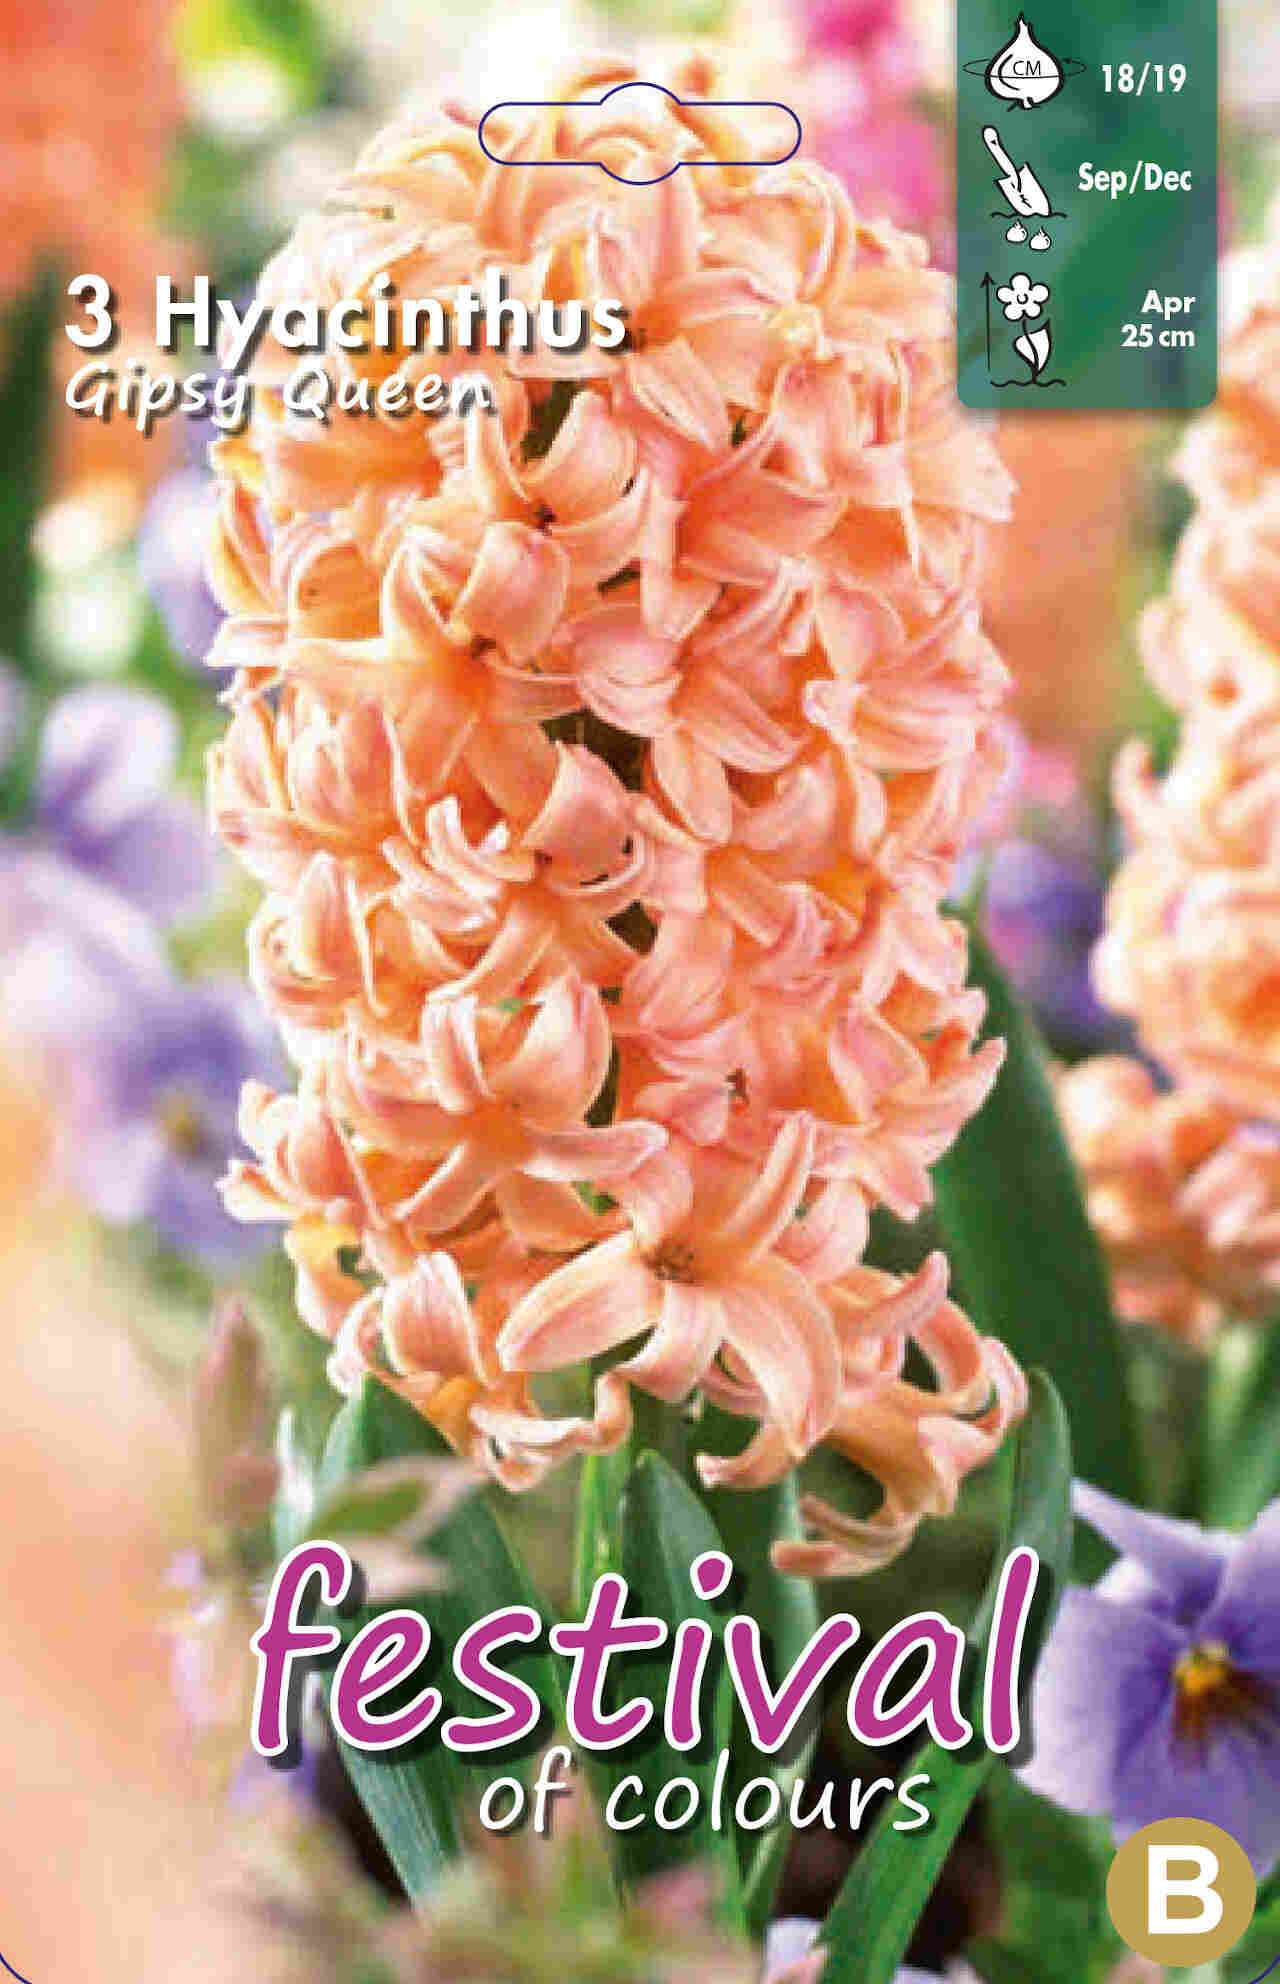 Hyacinths Gipsy Queen 18/19